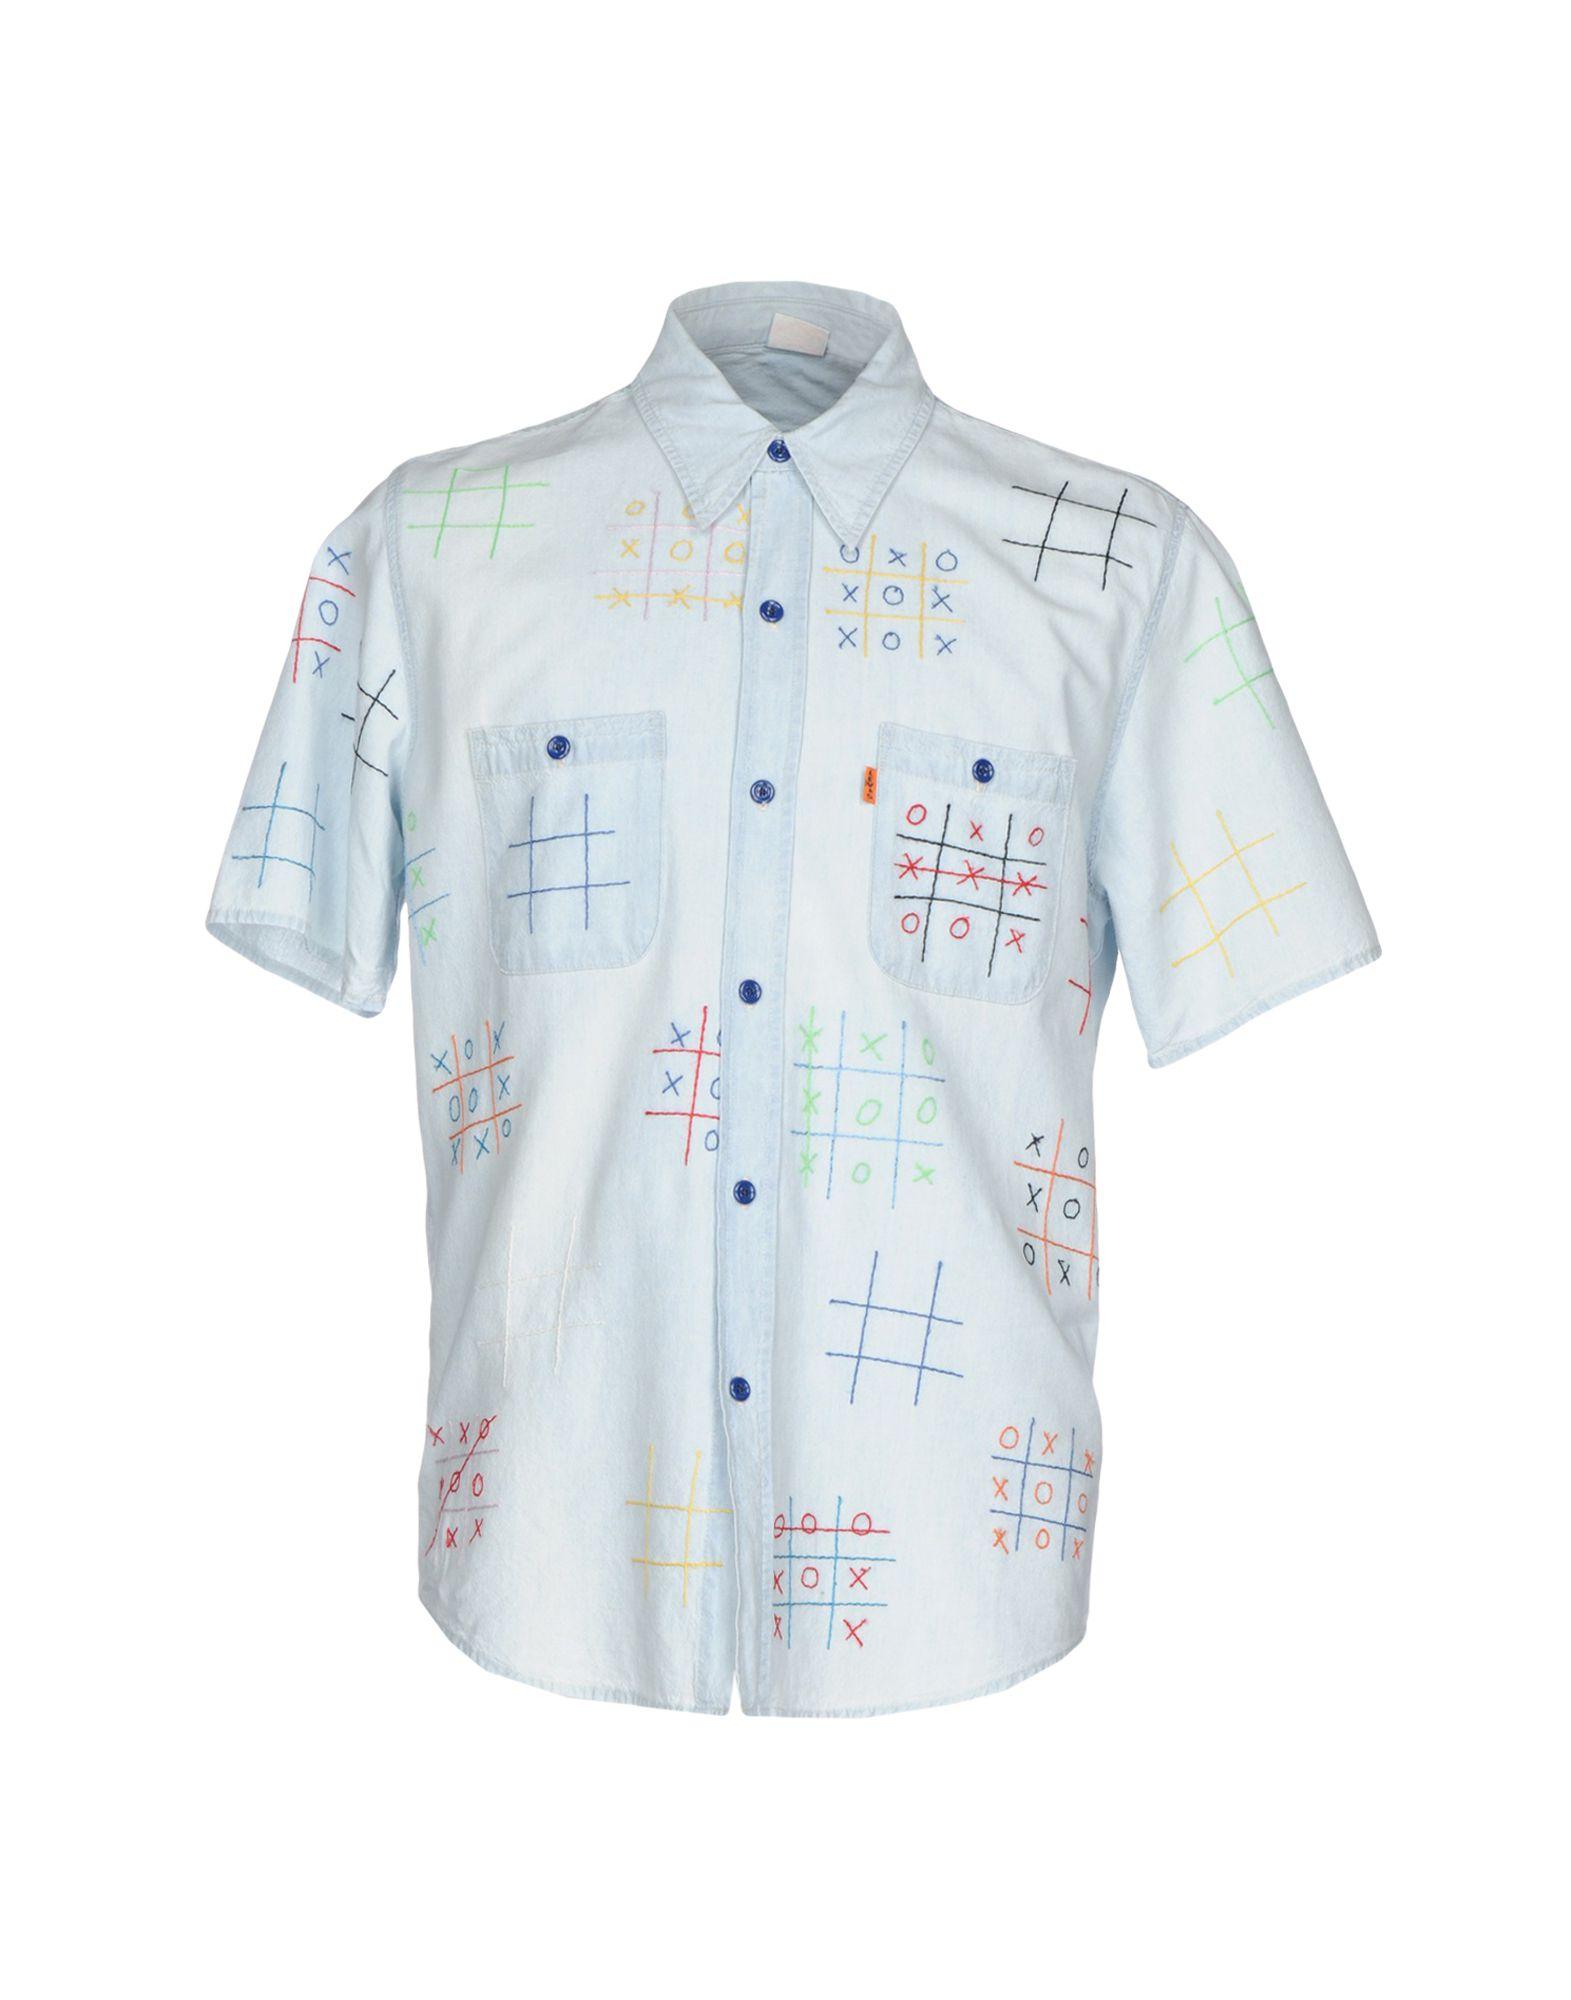 цена на LEVI'S VINTAGE CLOTHING Джинсовая рубашка